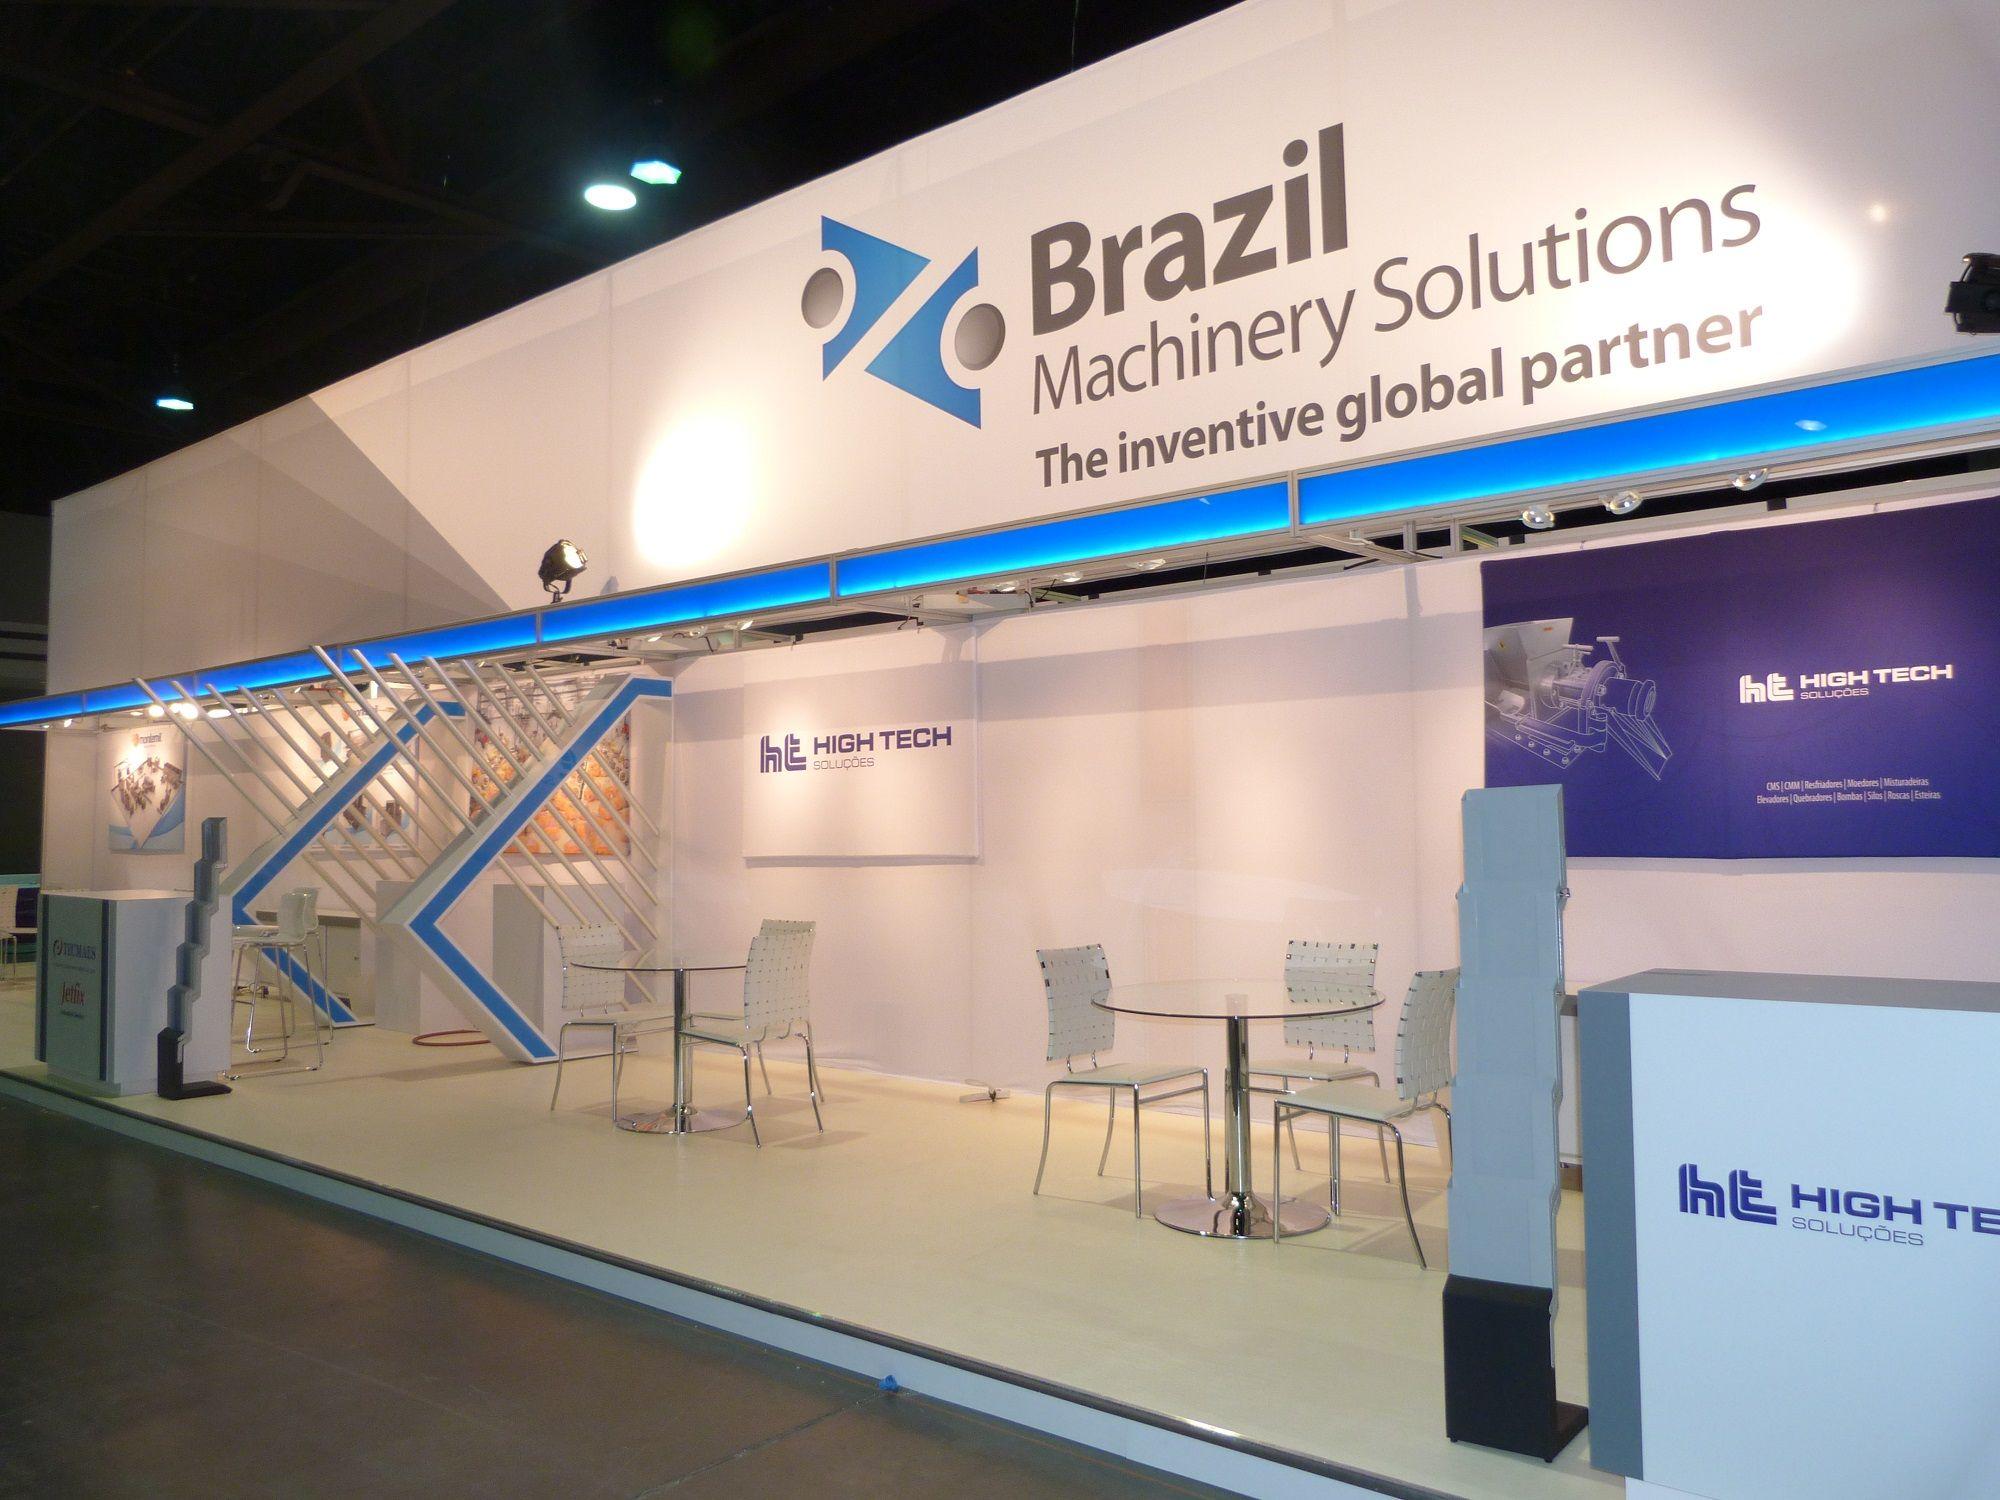 Wood Trade Show Booth : Ippe atlanta brazilian pavilion